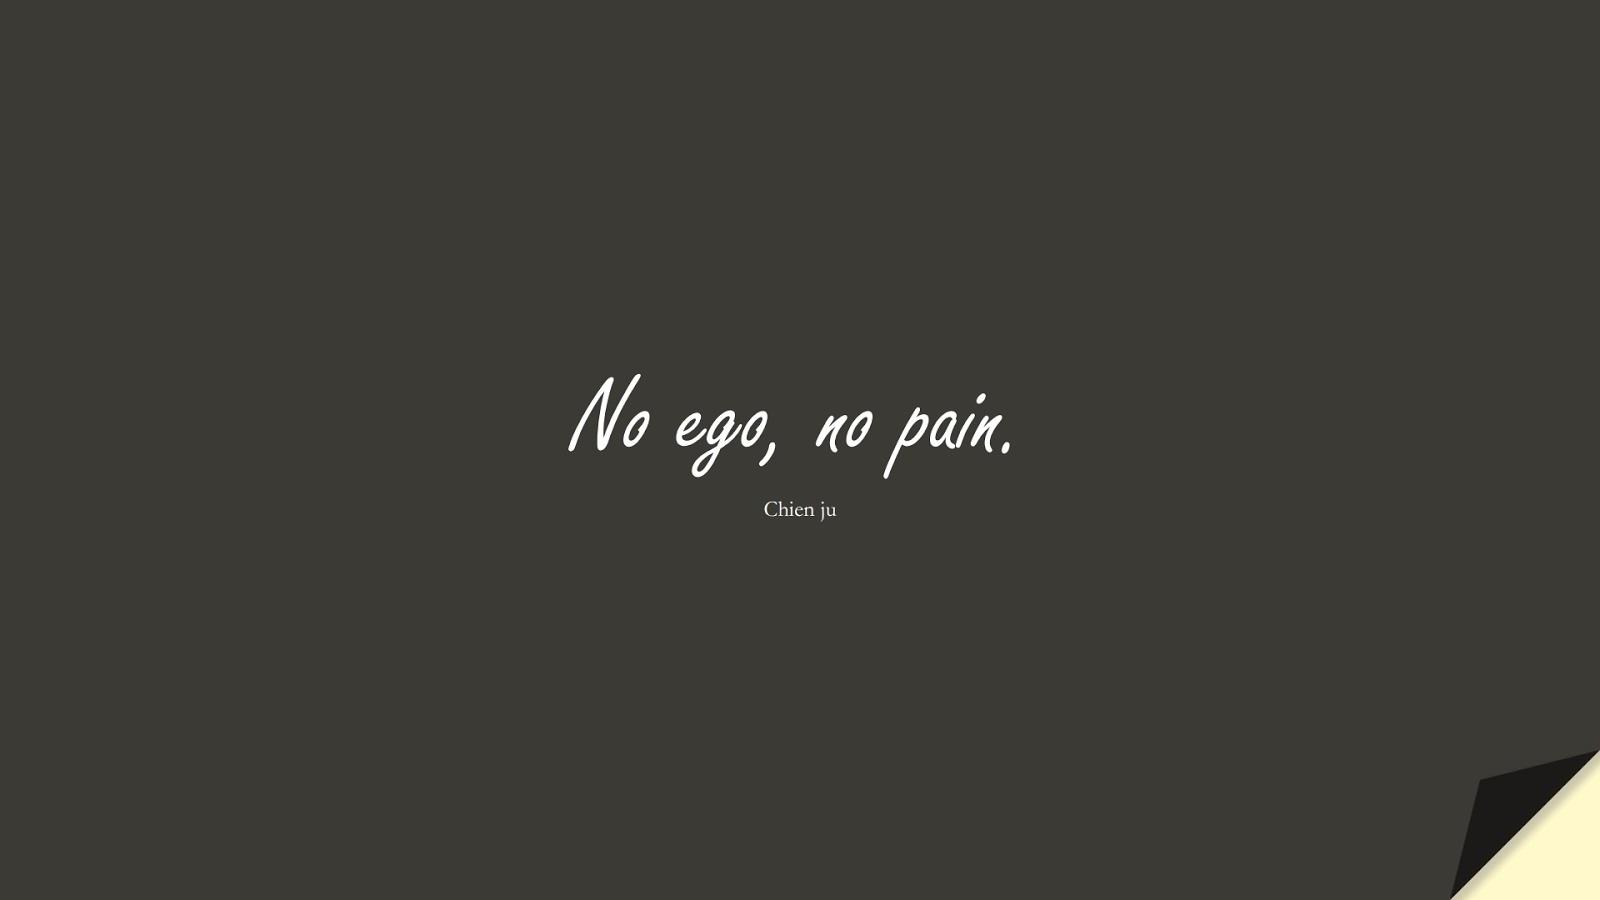 No ego, no pain. (Chien ju);  #ShortQuotes